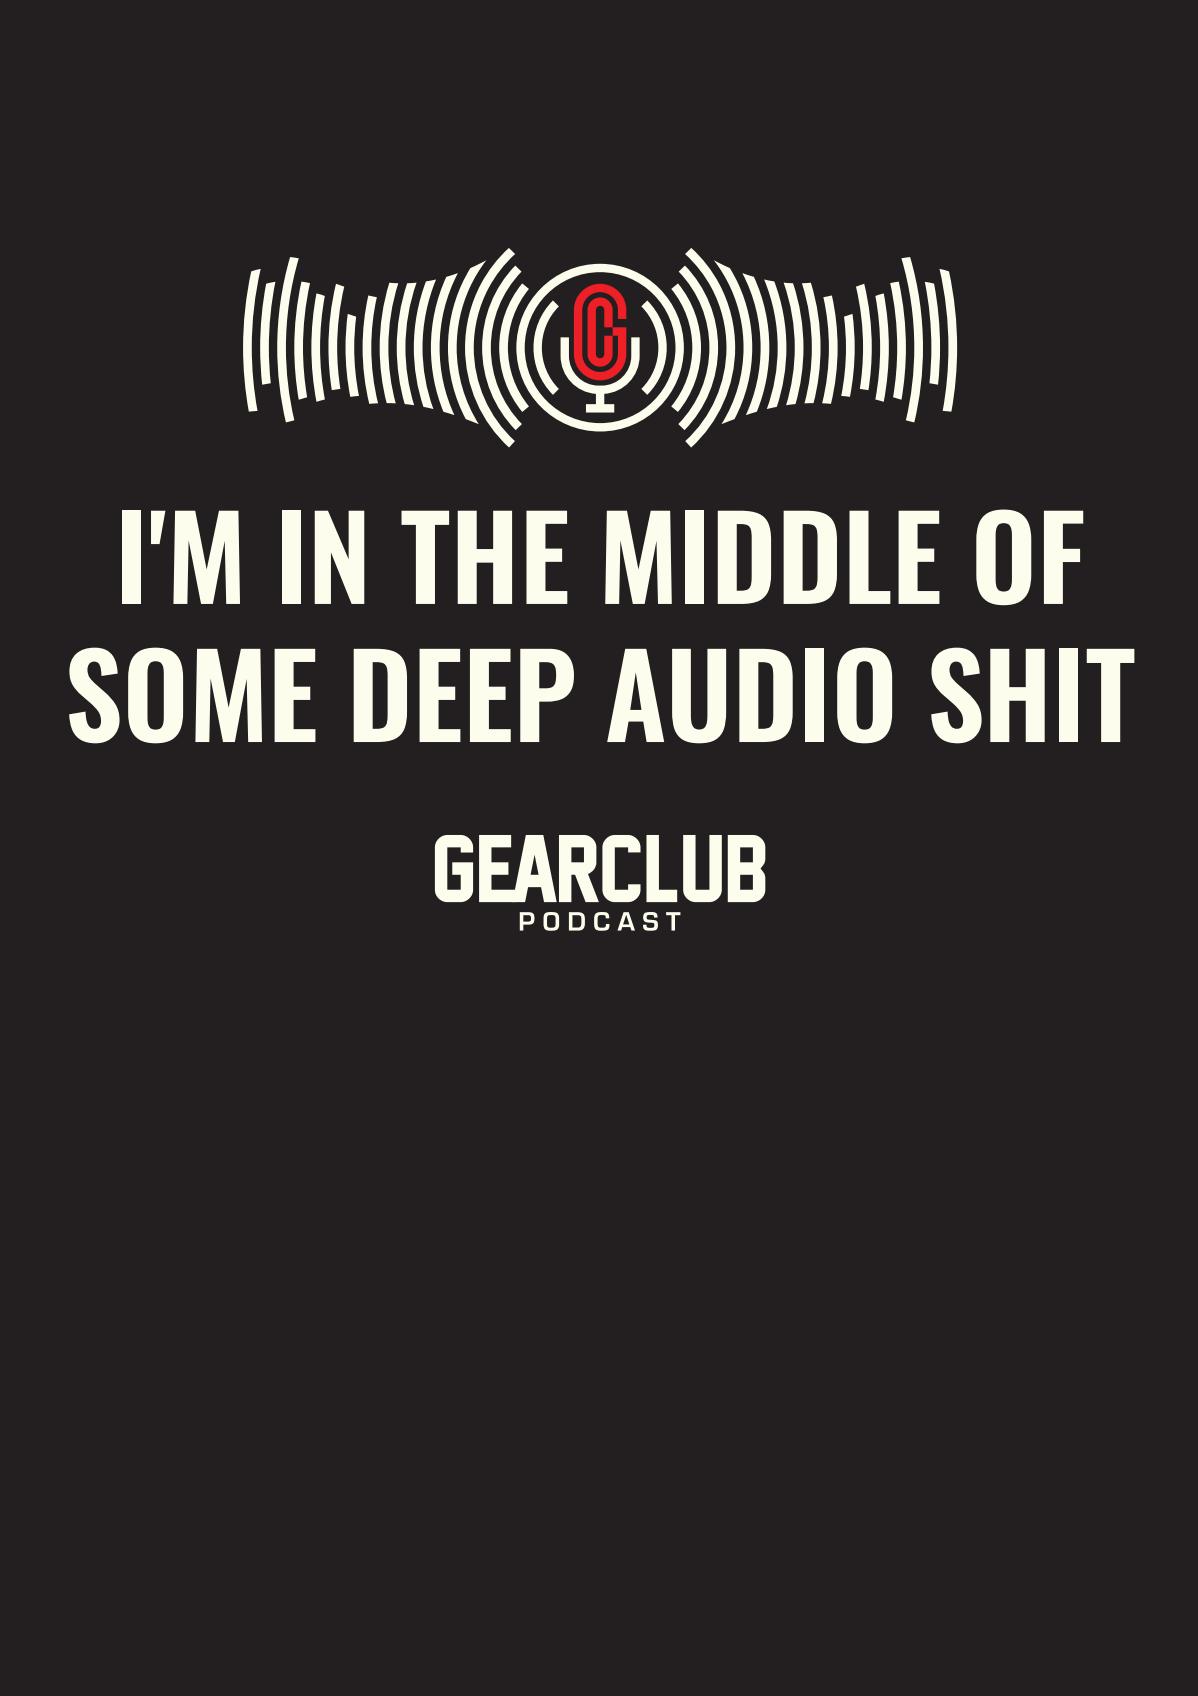 T-shirt for Gear Club